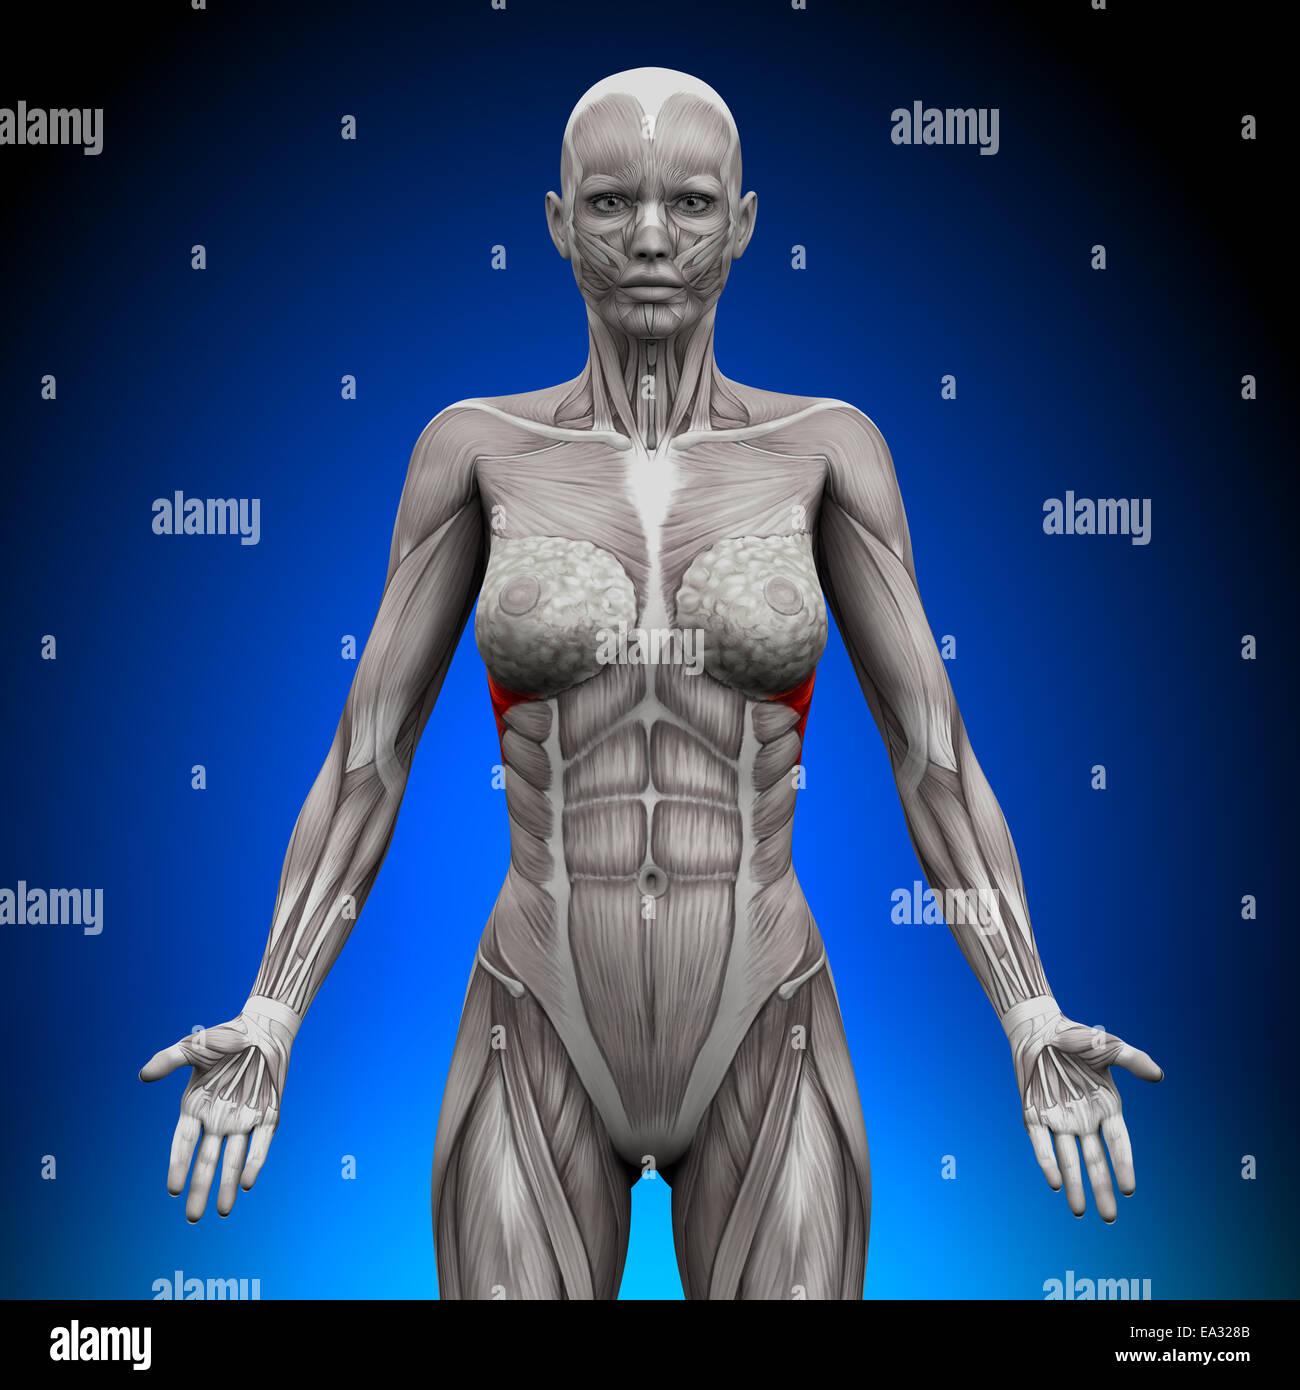 Serratus Anterior - Female Anatomy Muscles - Stock Image